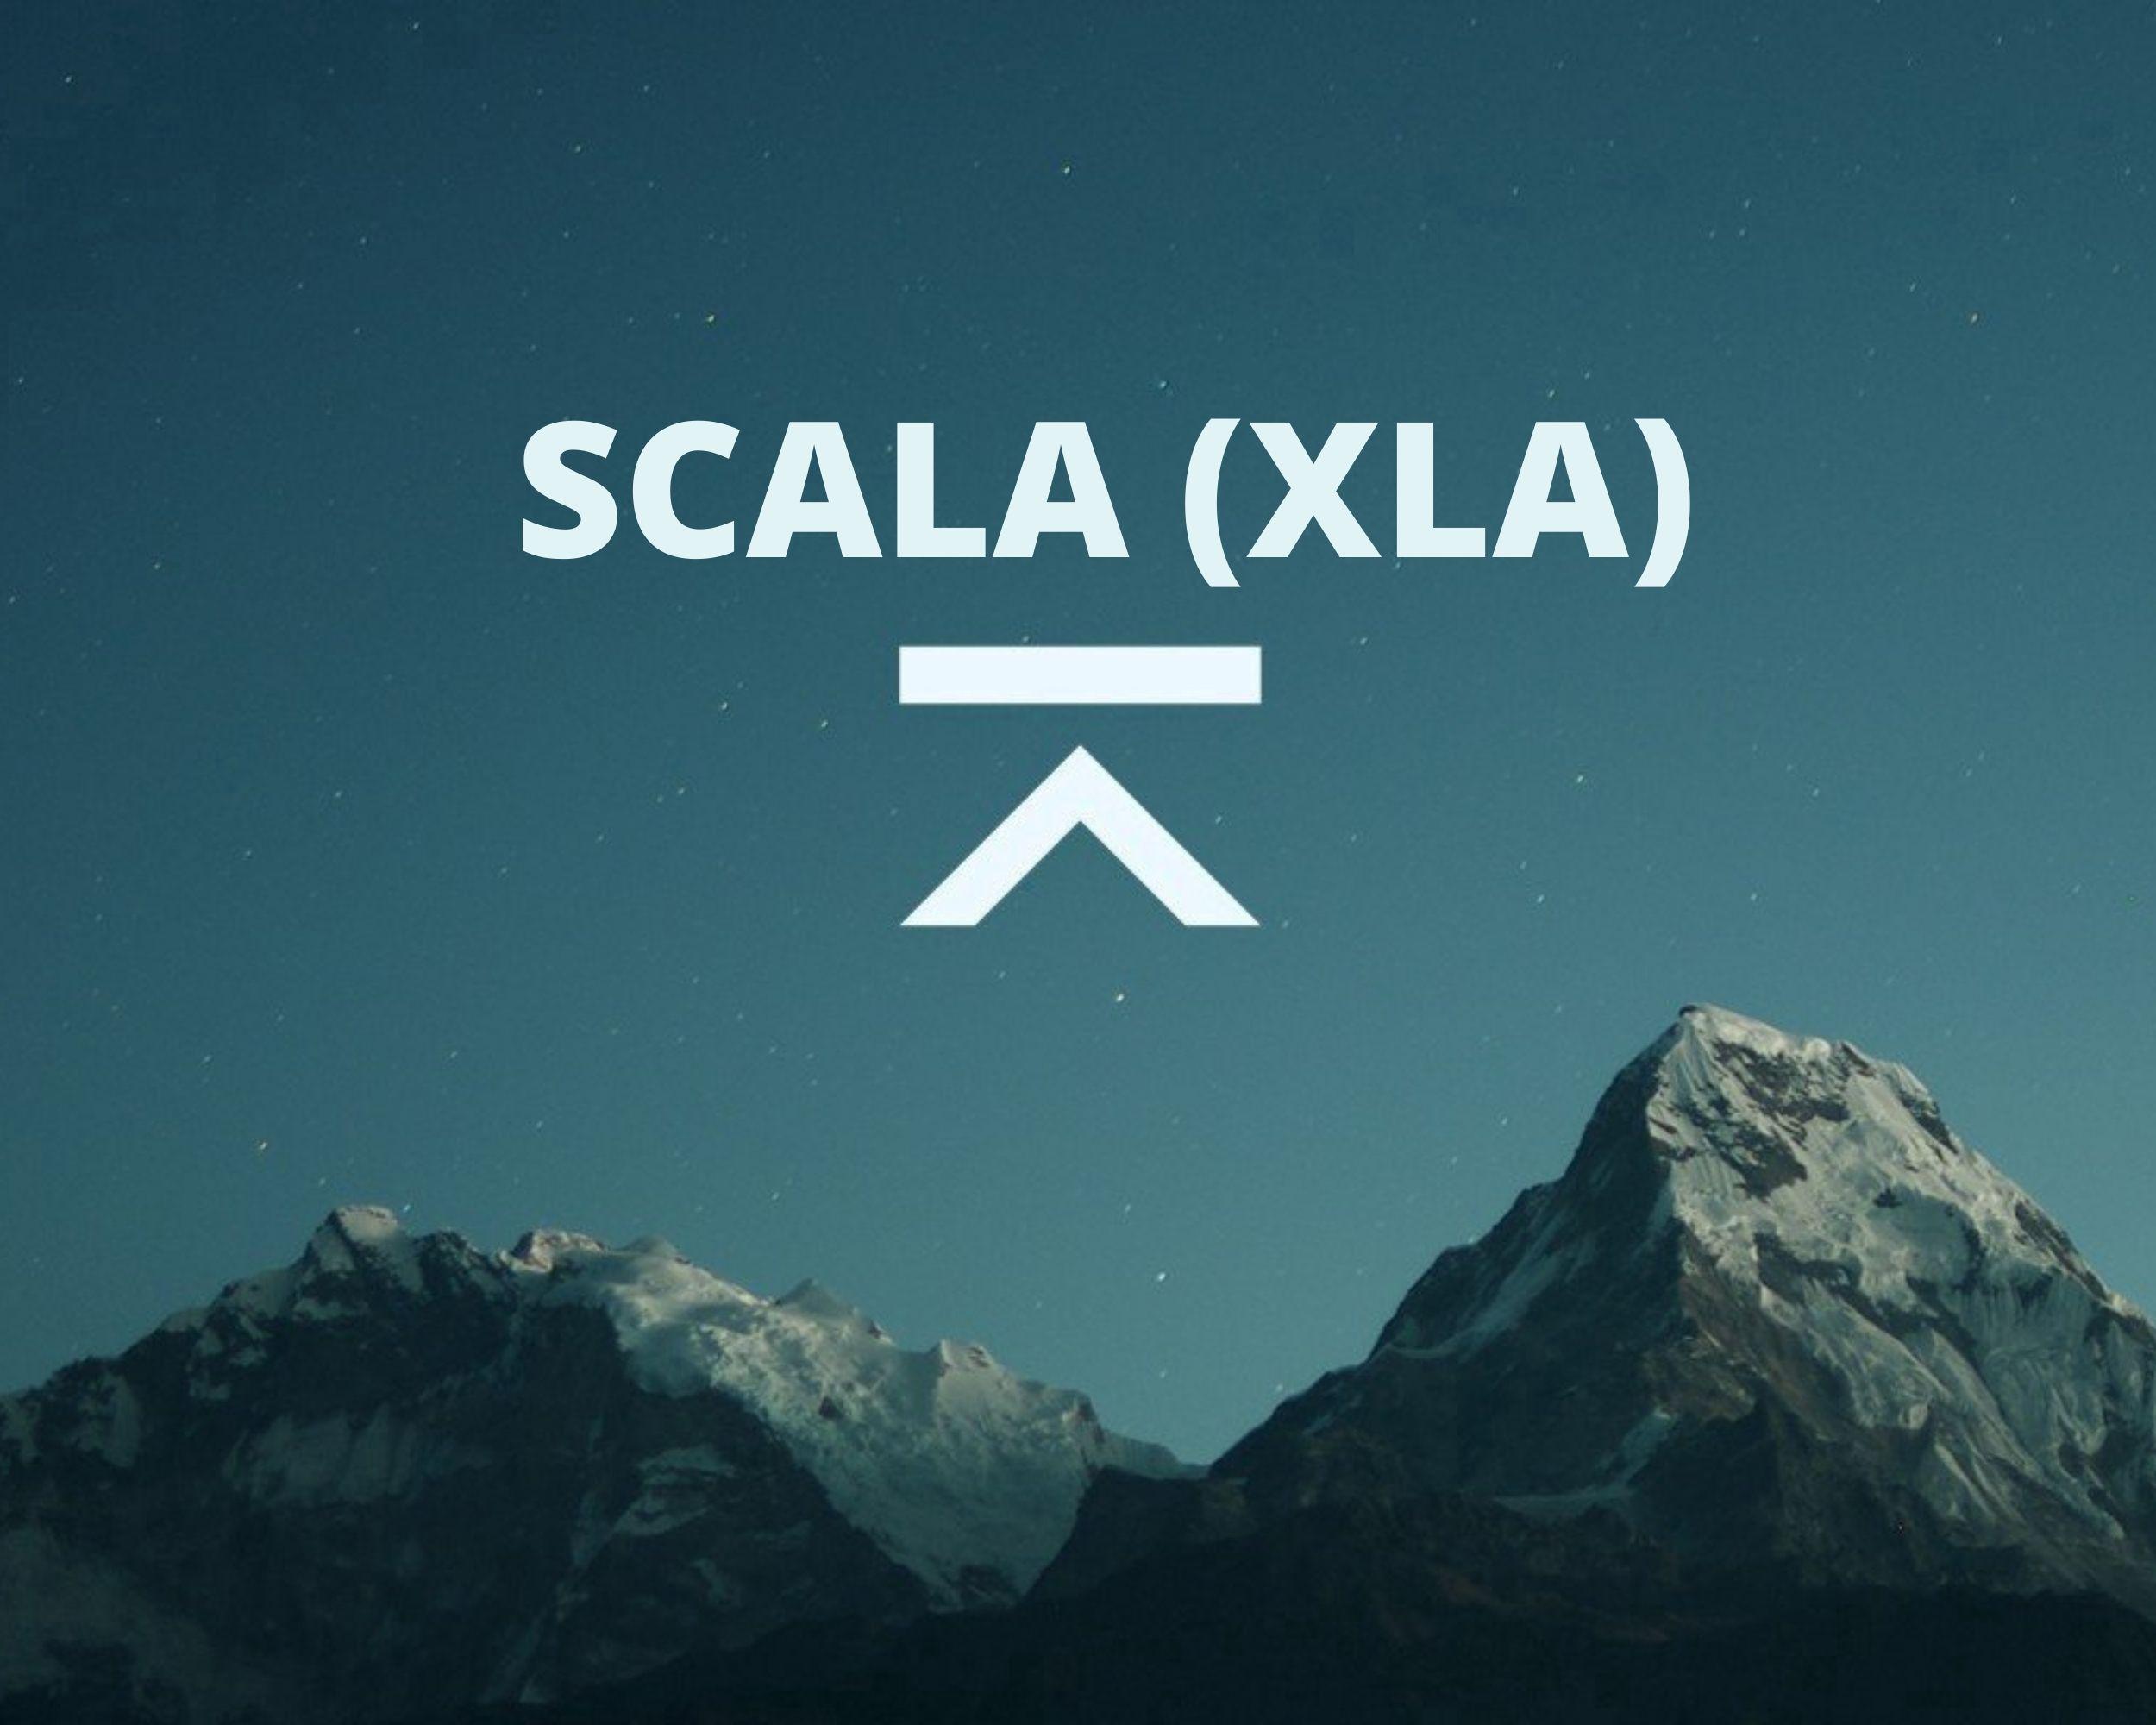 SCALA XLA